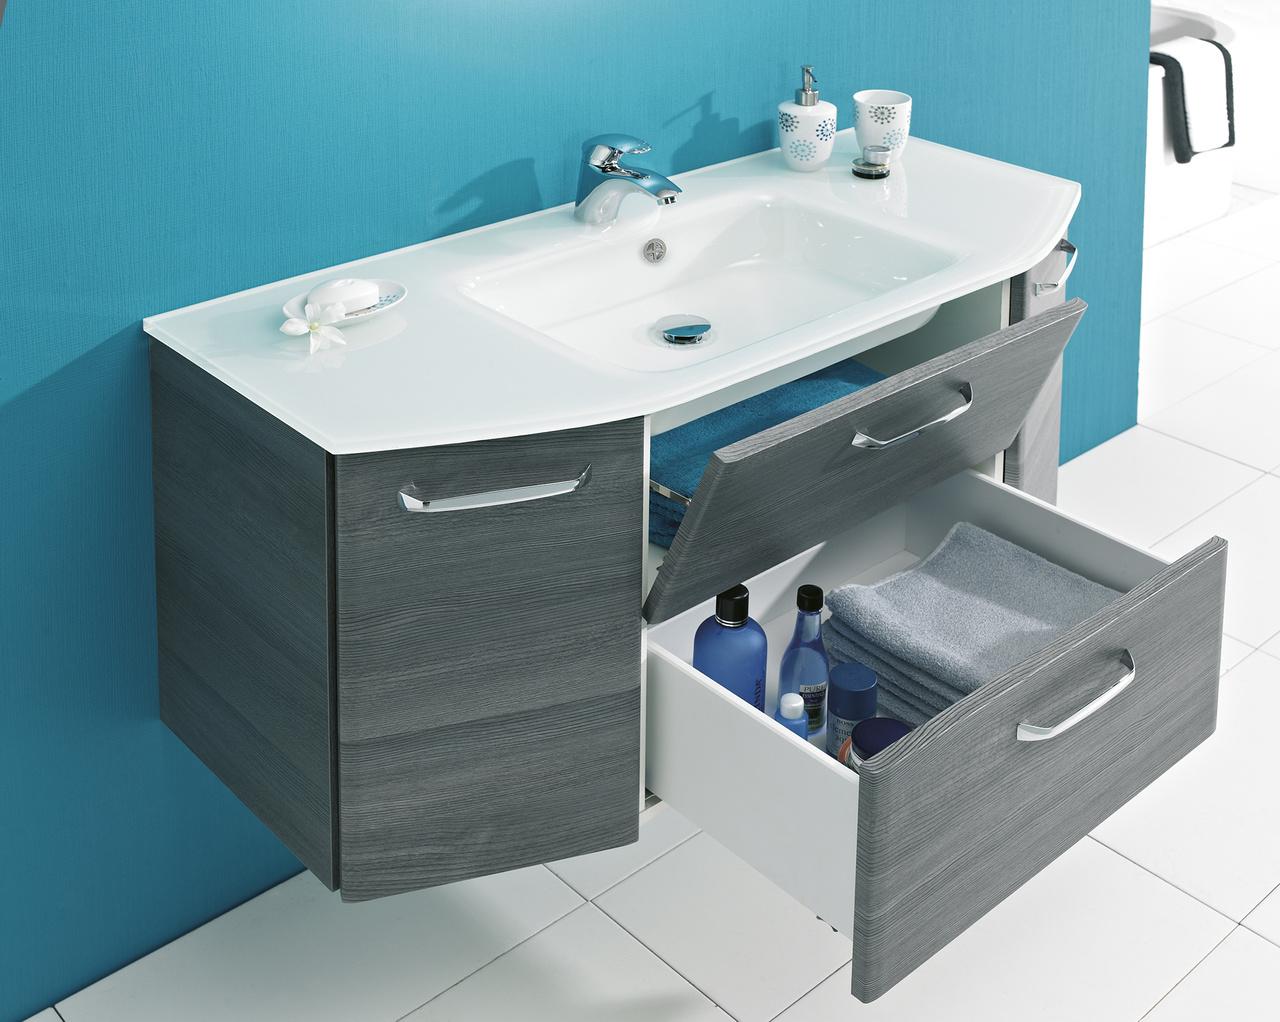 328 Alika Quickset Bathroom Furniture Brands Furniture By Pelipal